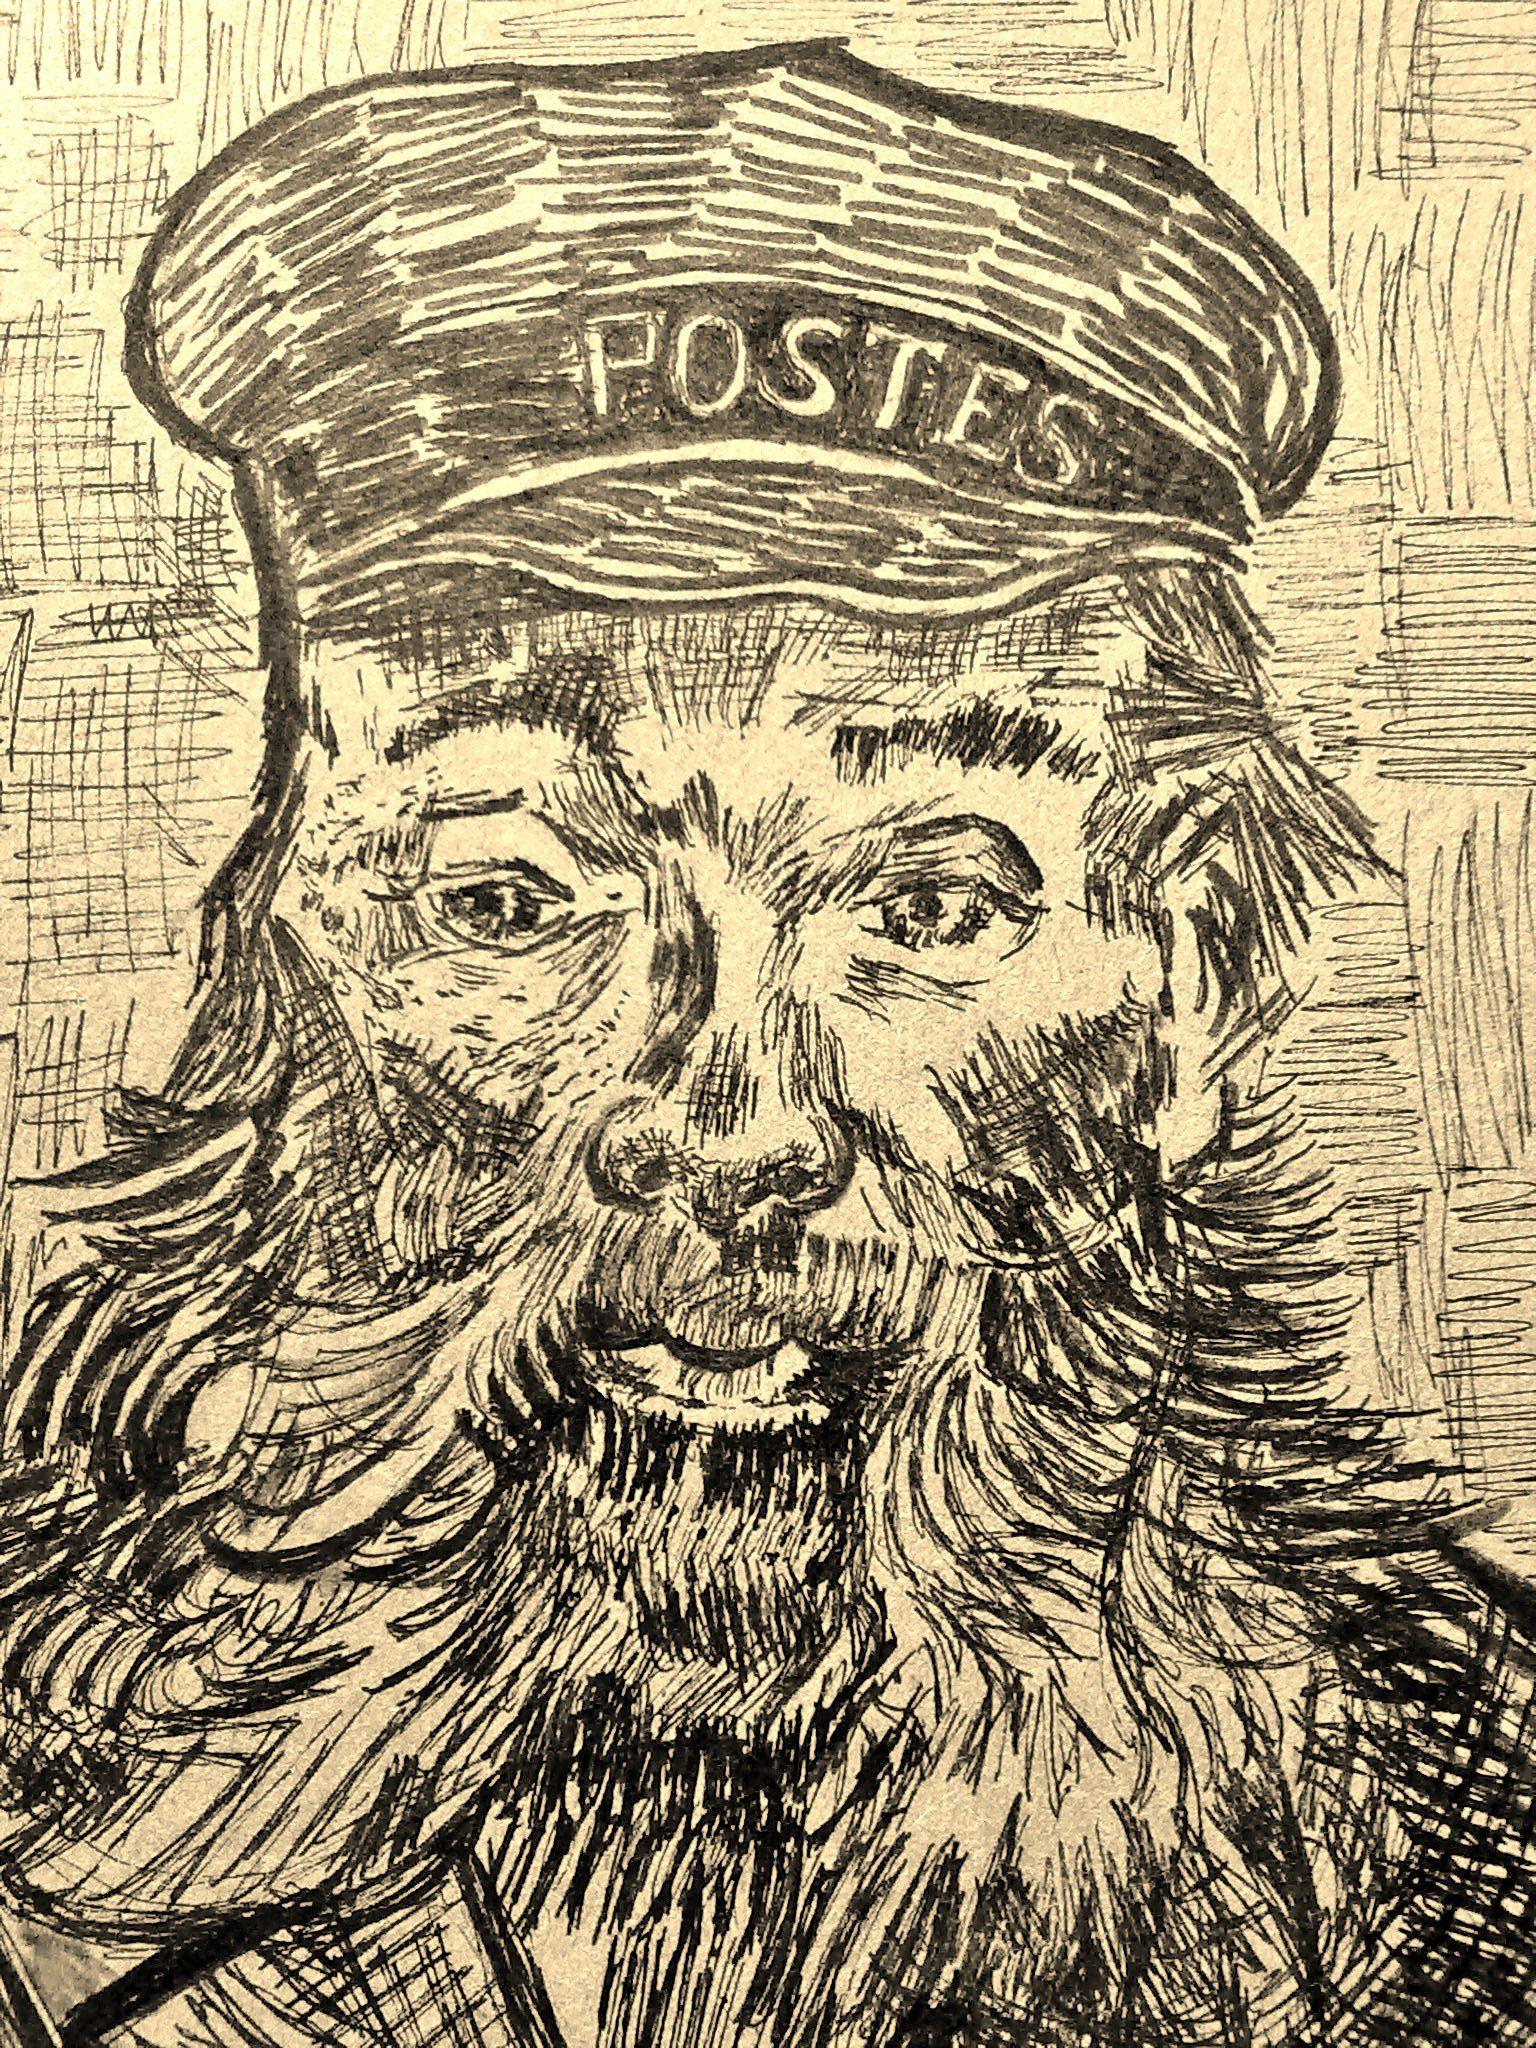 Postie By Julie Grant Field Drawn From Van Goghs Drawing